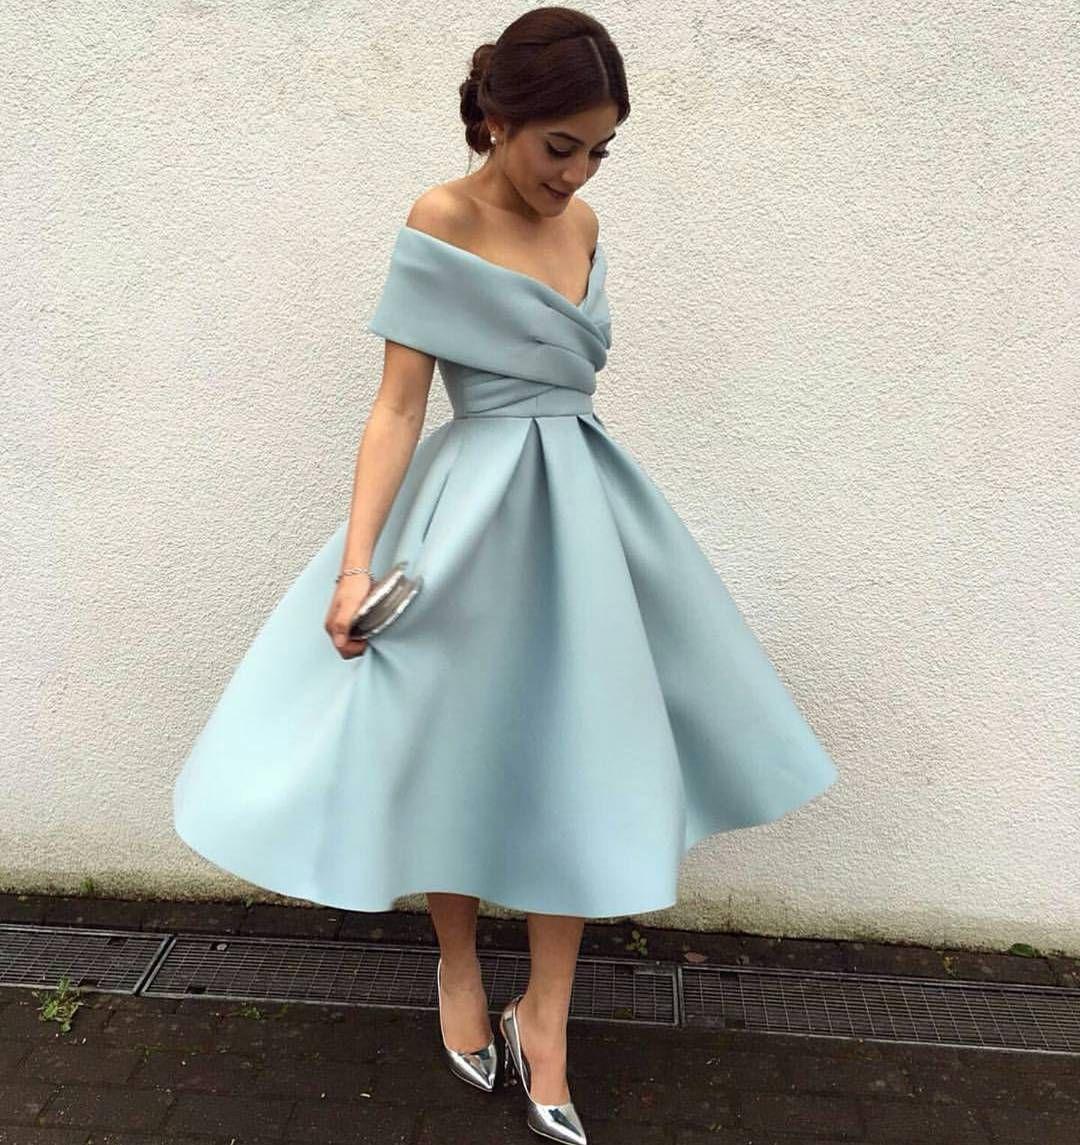 Pin by Yadira Ibarra on Dresses   Pinterest   Wedding wear ...